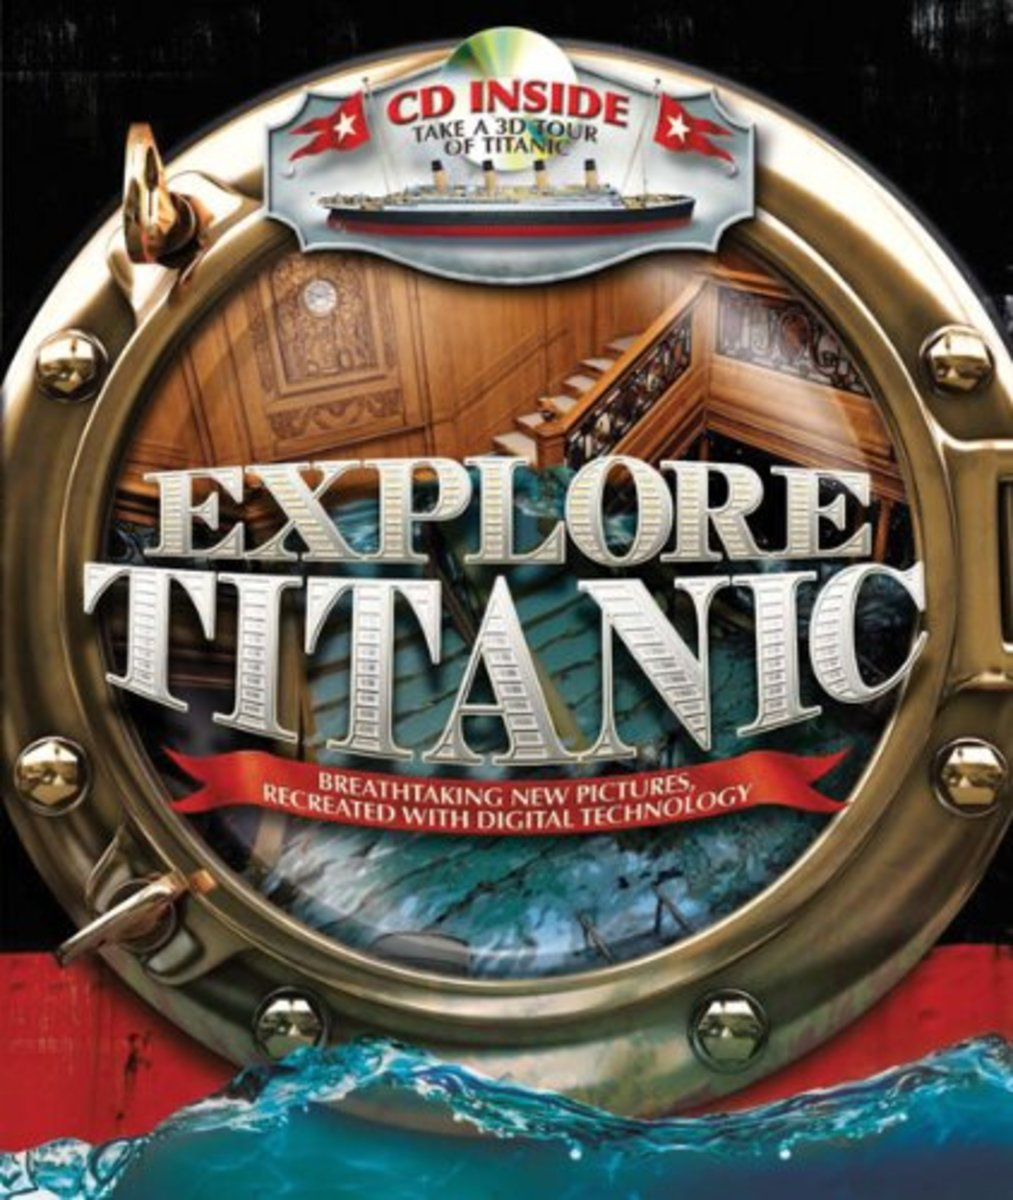 Explore Titanic: Breathtaking New Pictures